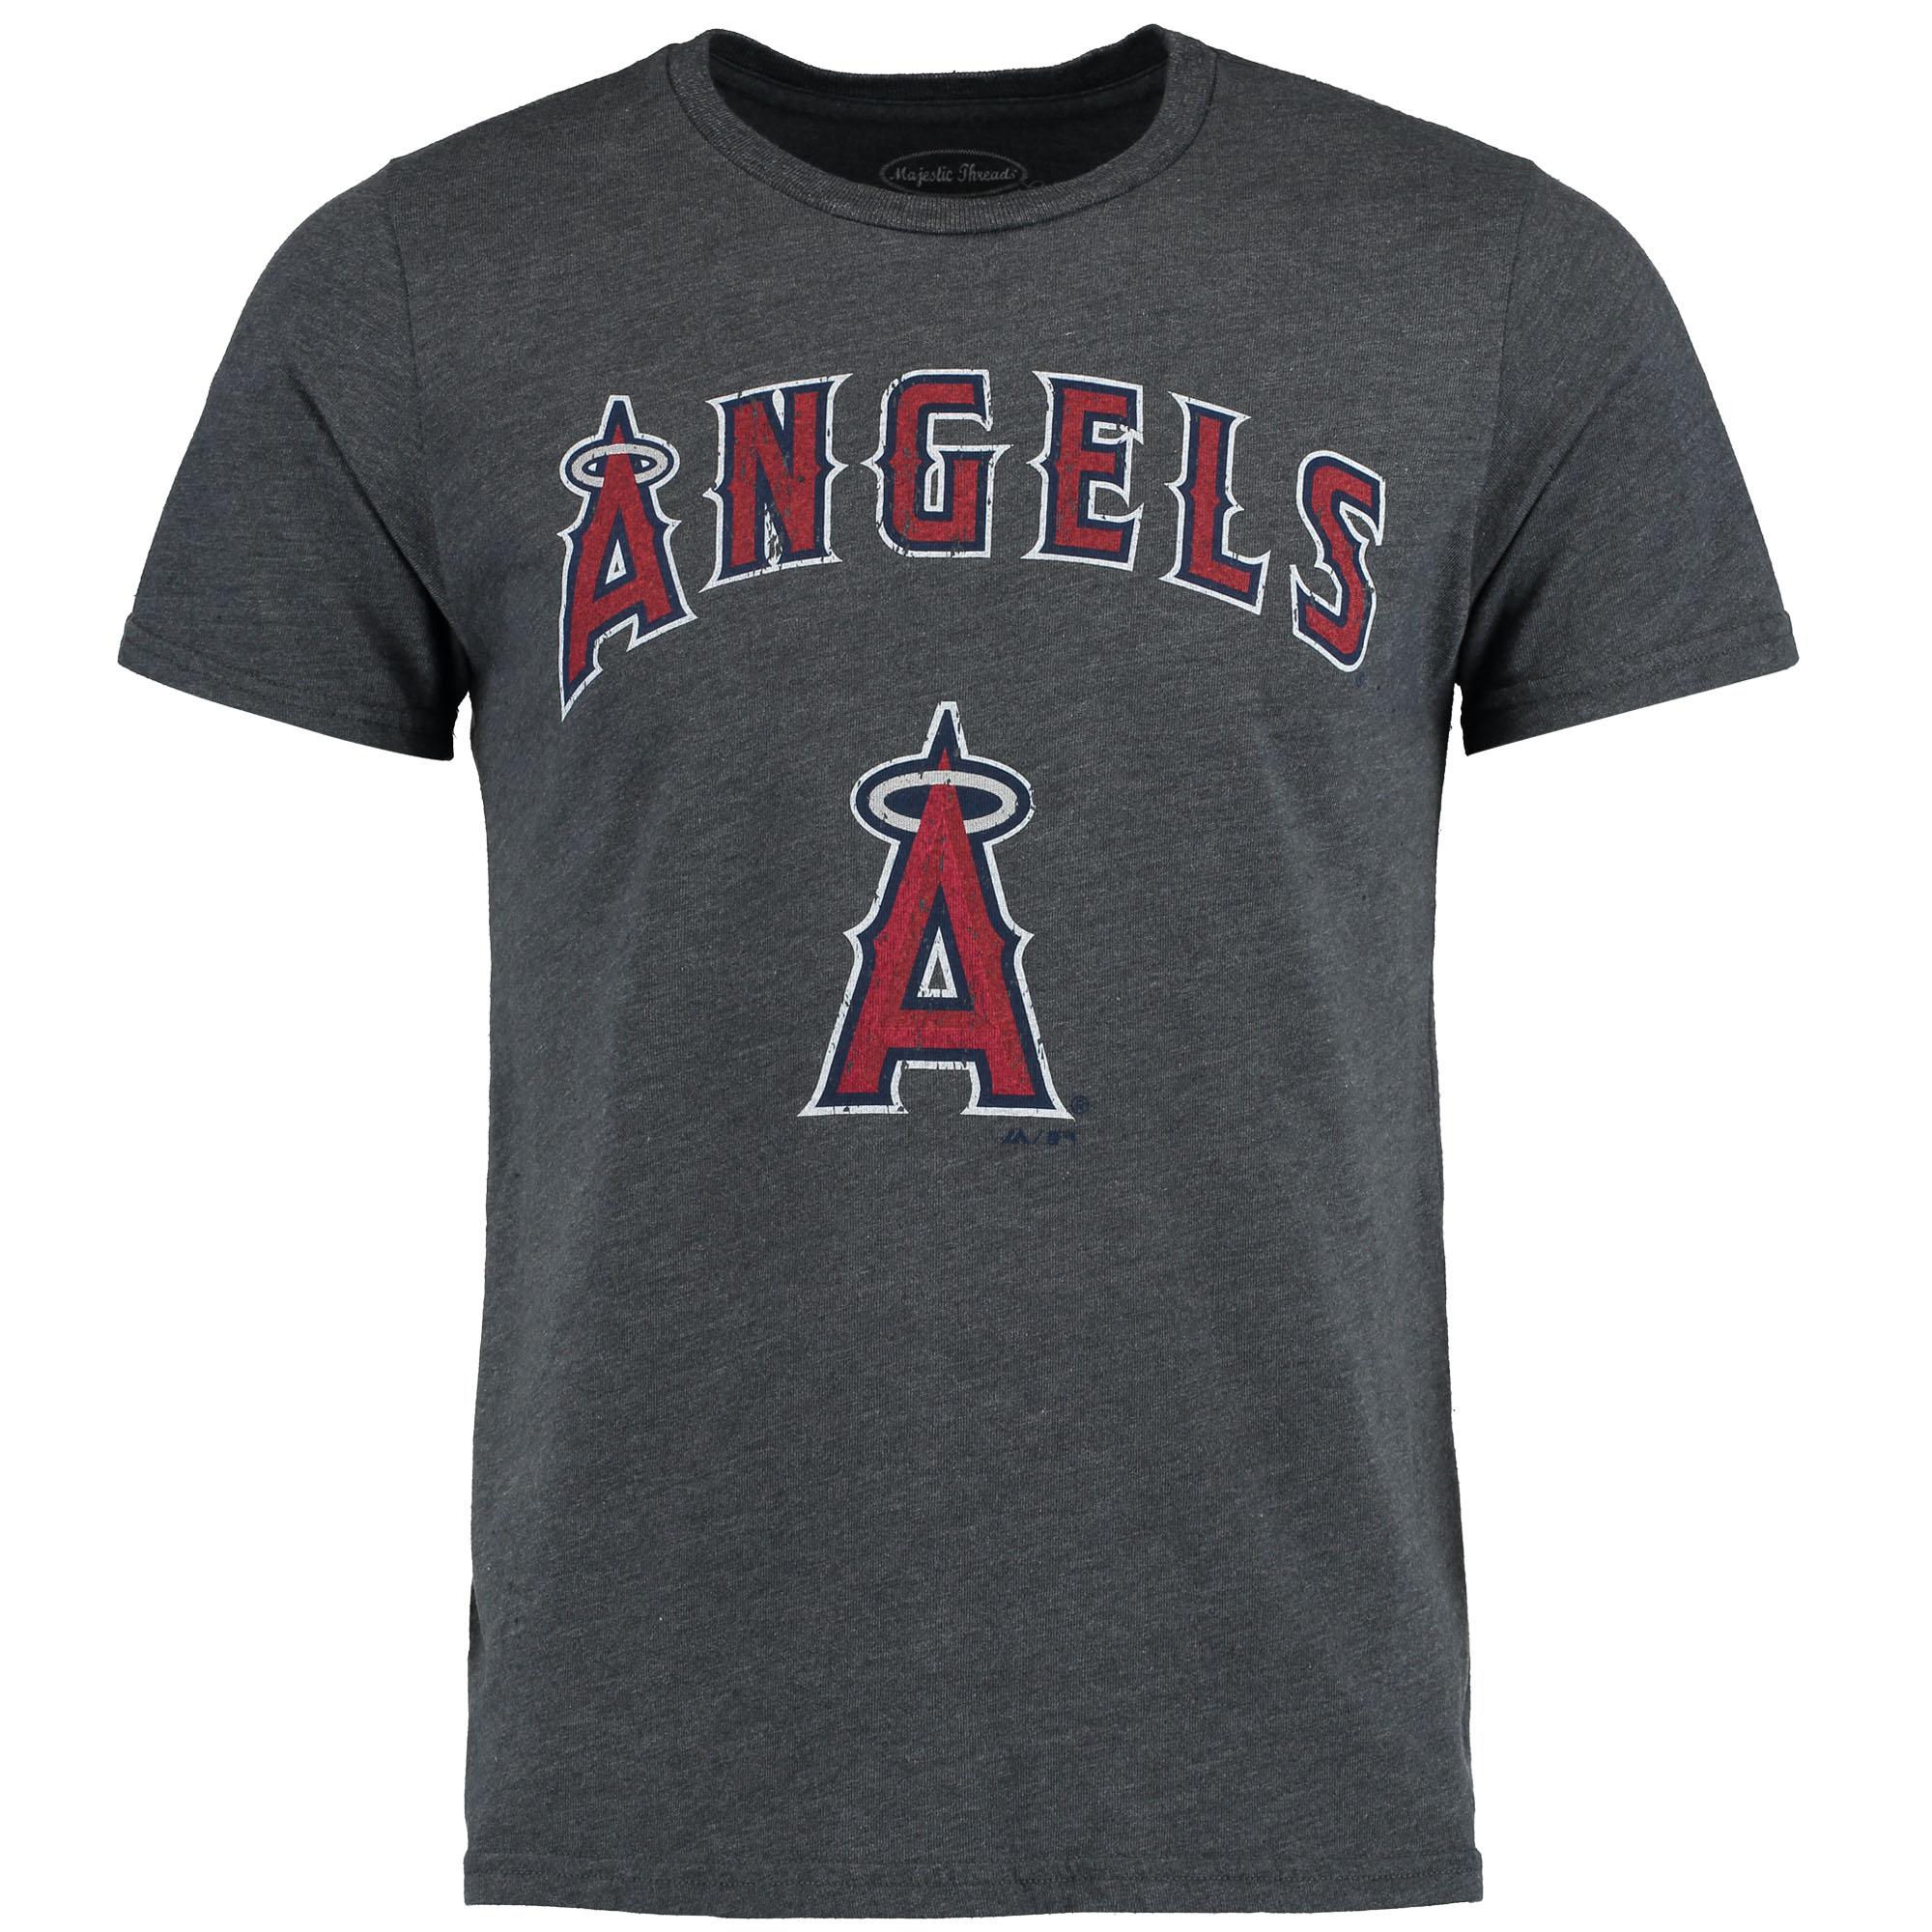 Los Angeles Angels Majestic Threads Premium Granite Tri-Blend T-Shirt - Charcoal